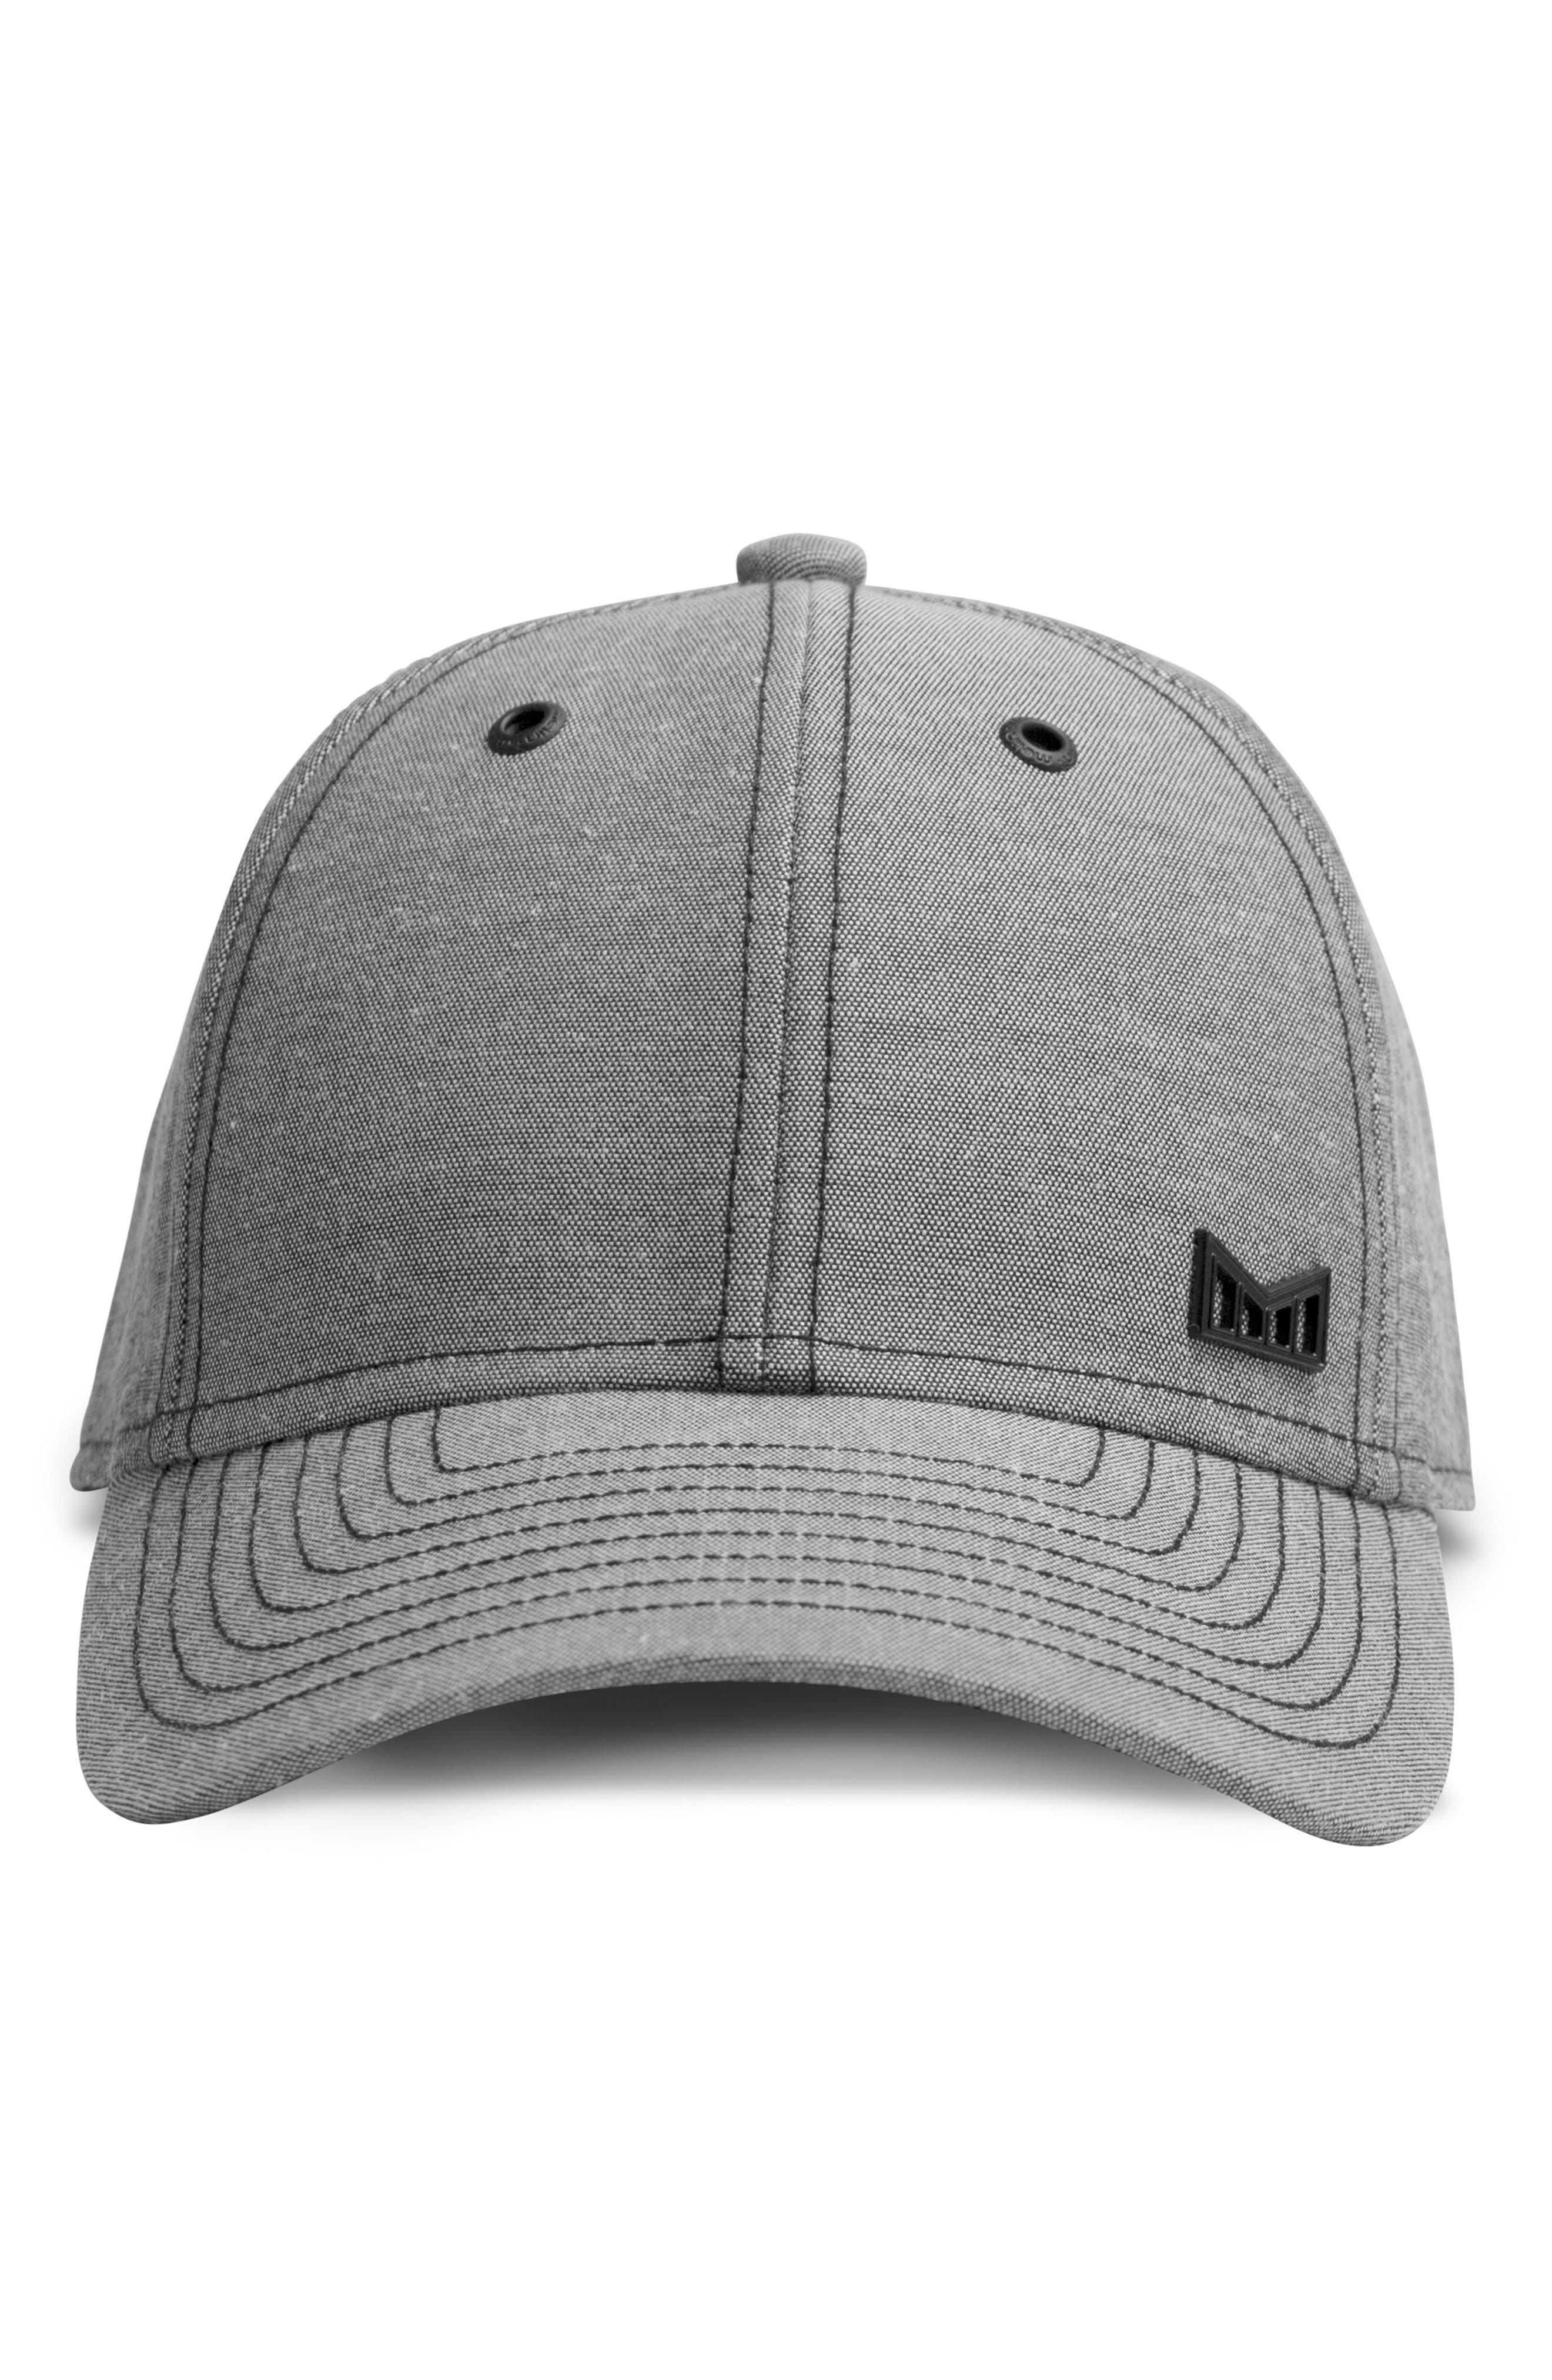 Scholar Snapback Baseball Cap,                             Alternate thumbnail 2, color,                             001